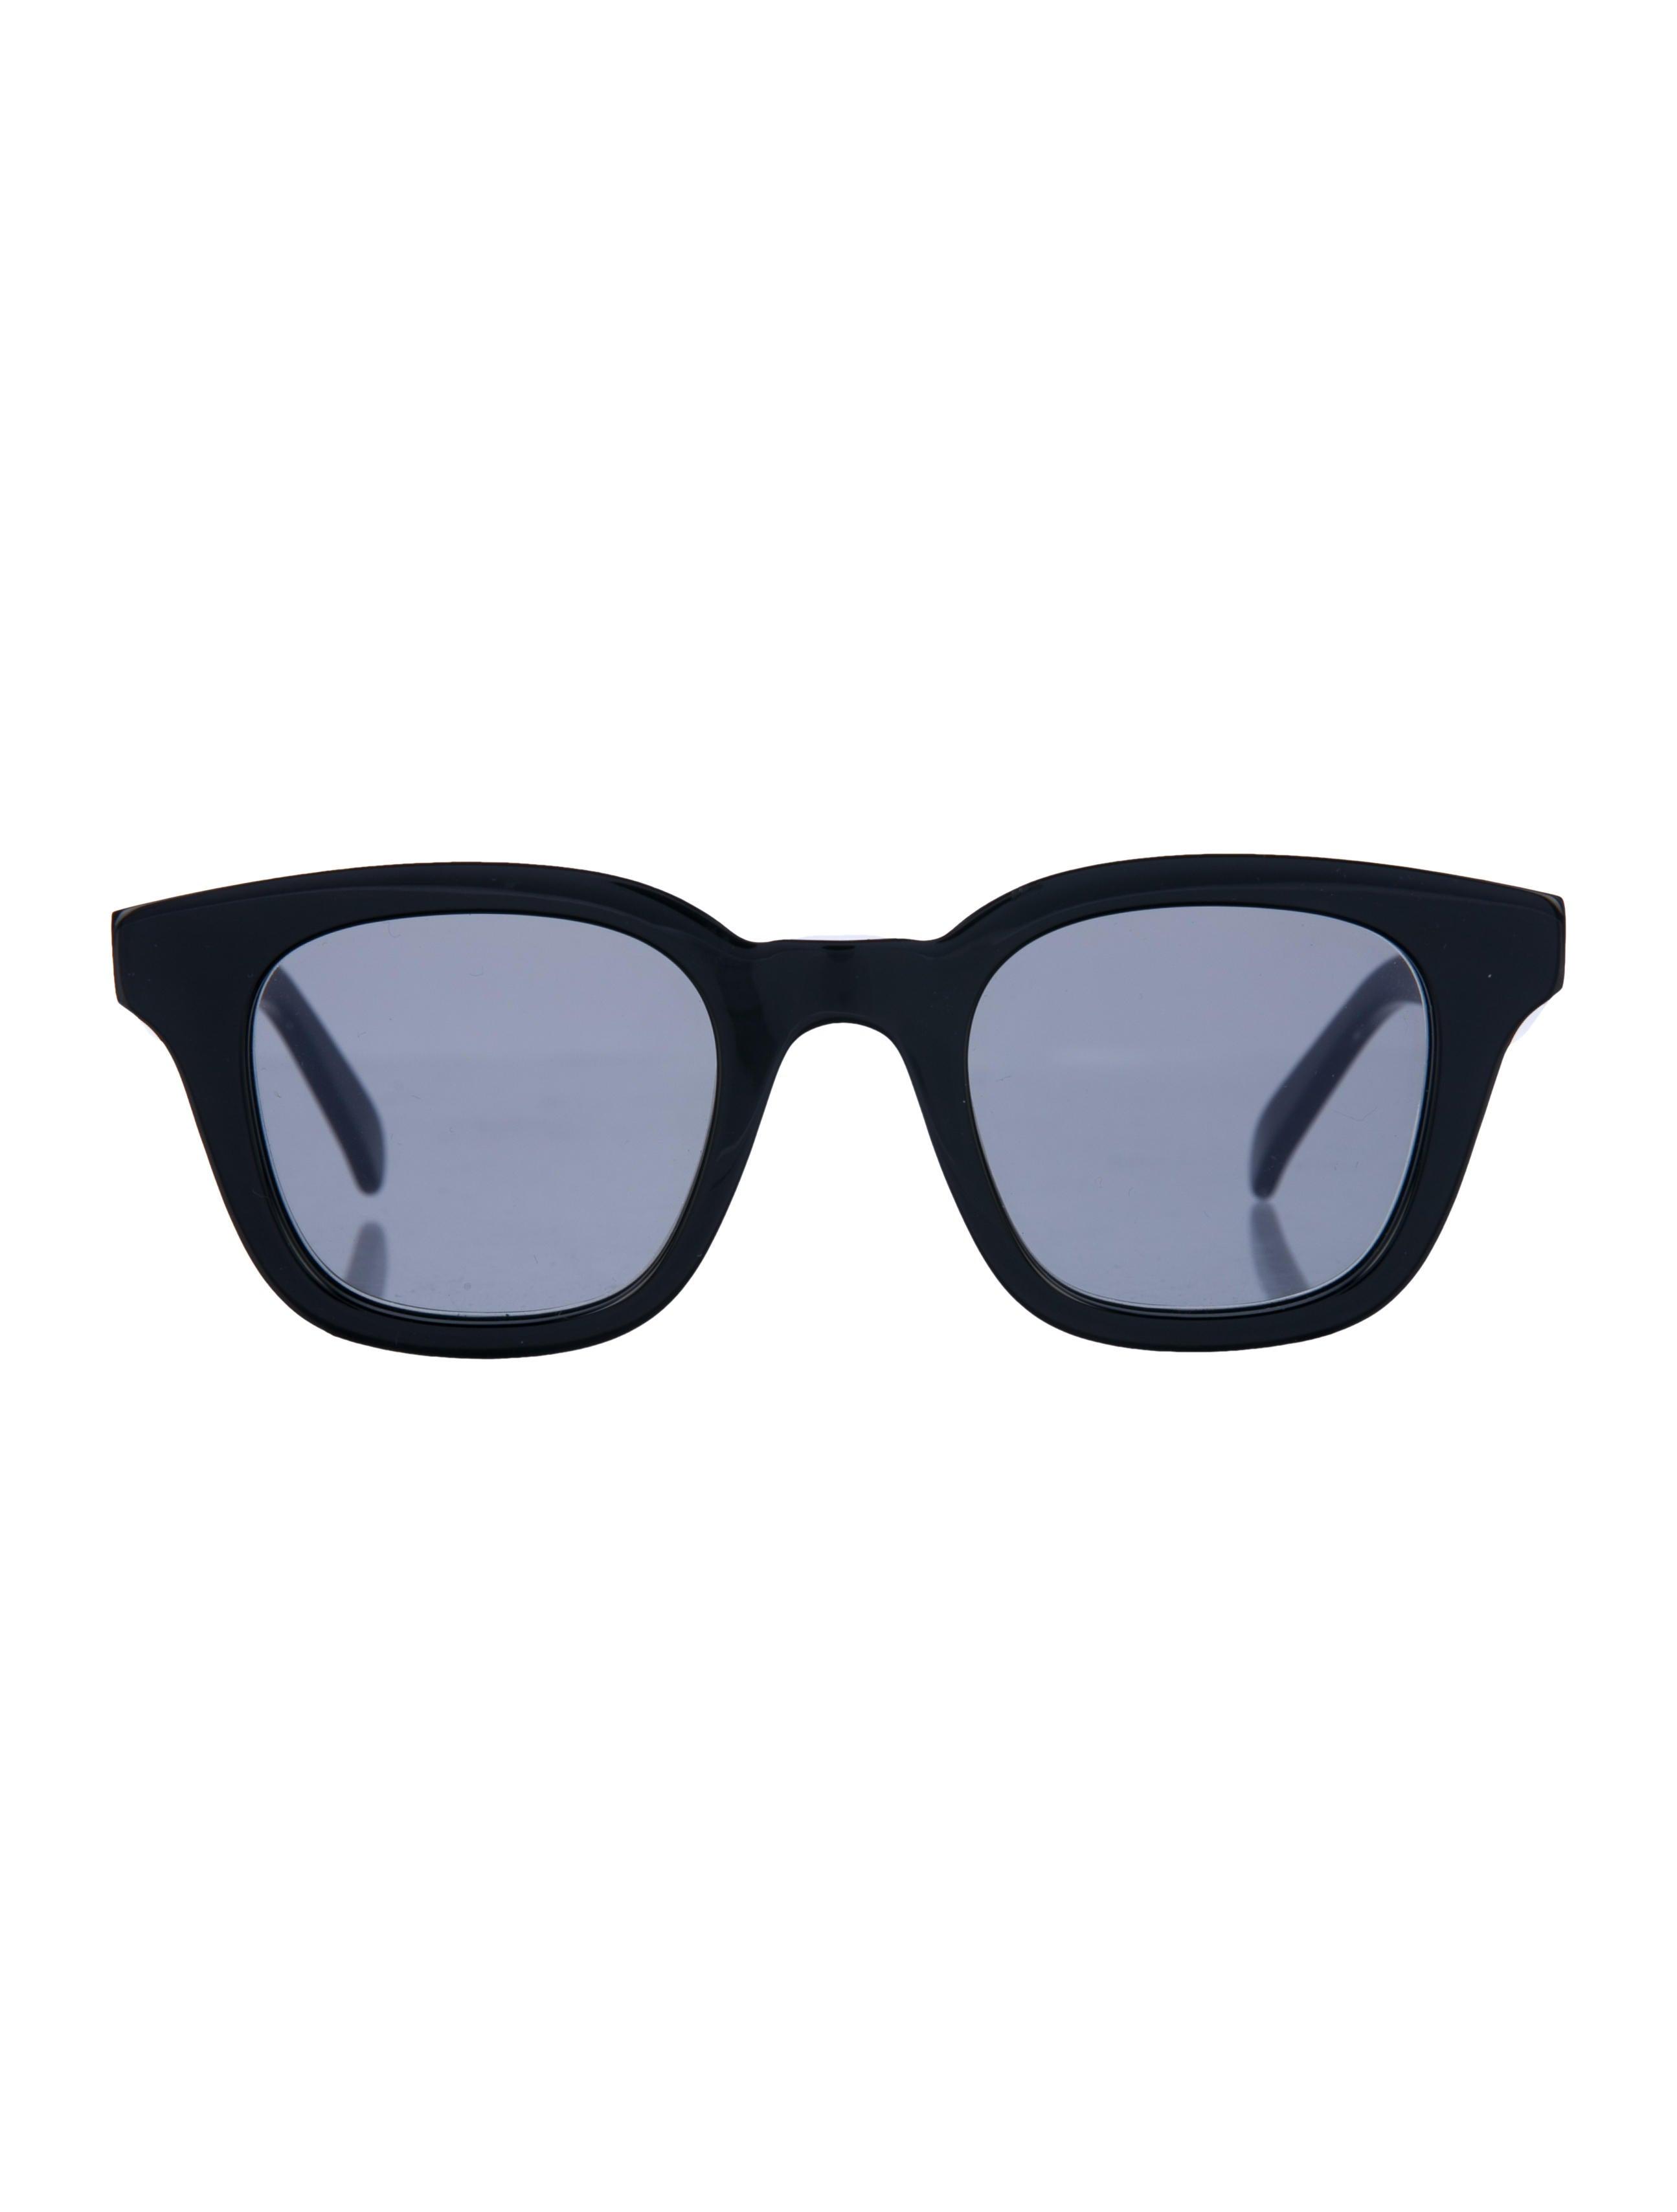 bf3fd21f0150a Celine Céline Sacha Wayfarer Sunglasses - Accessories - CEL59041 ...